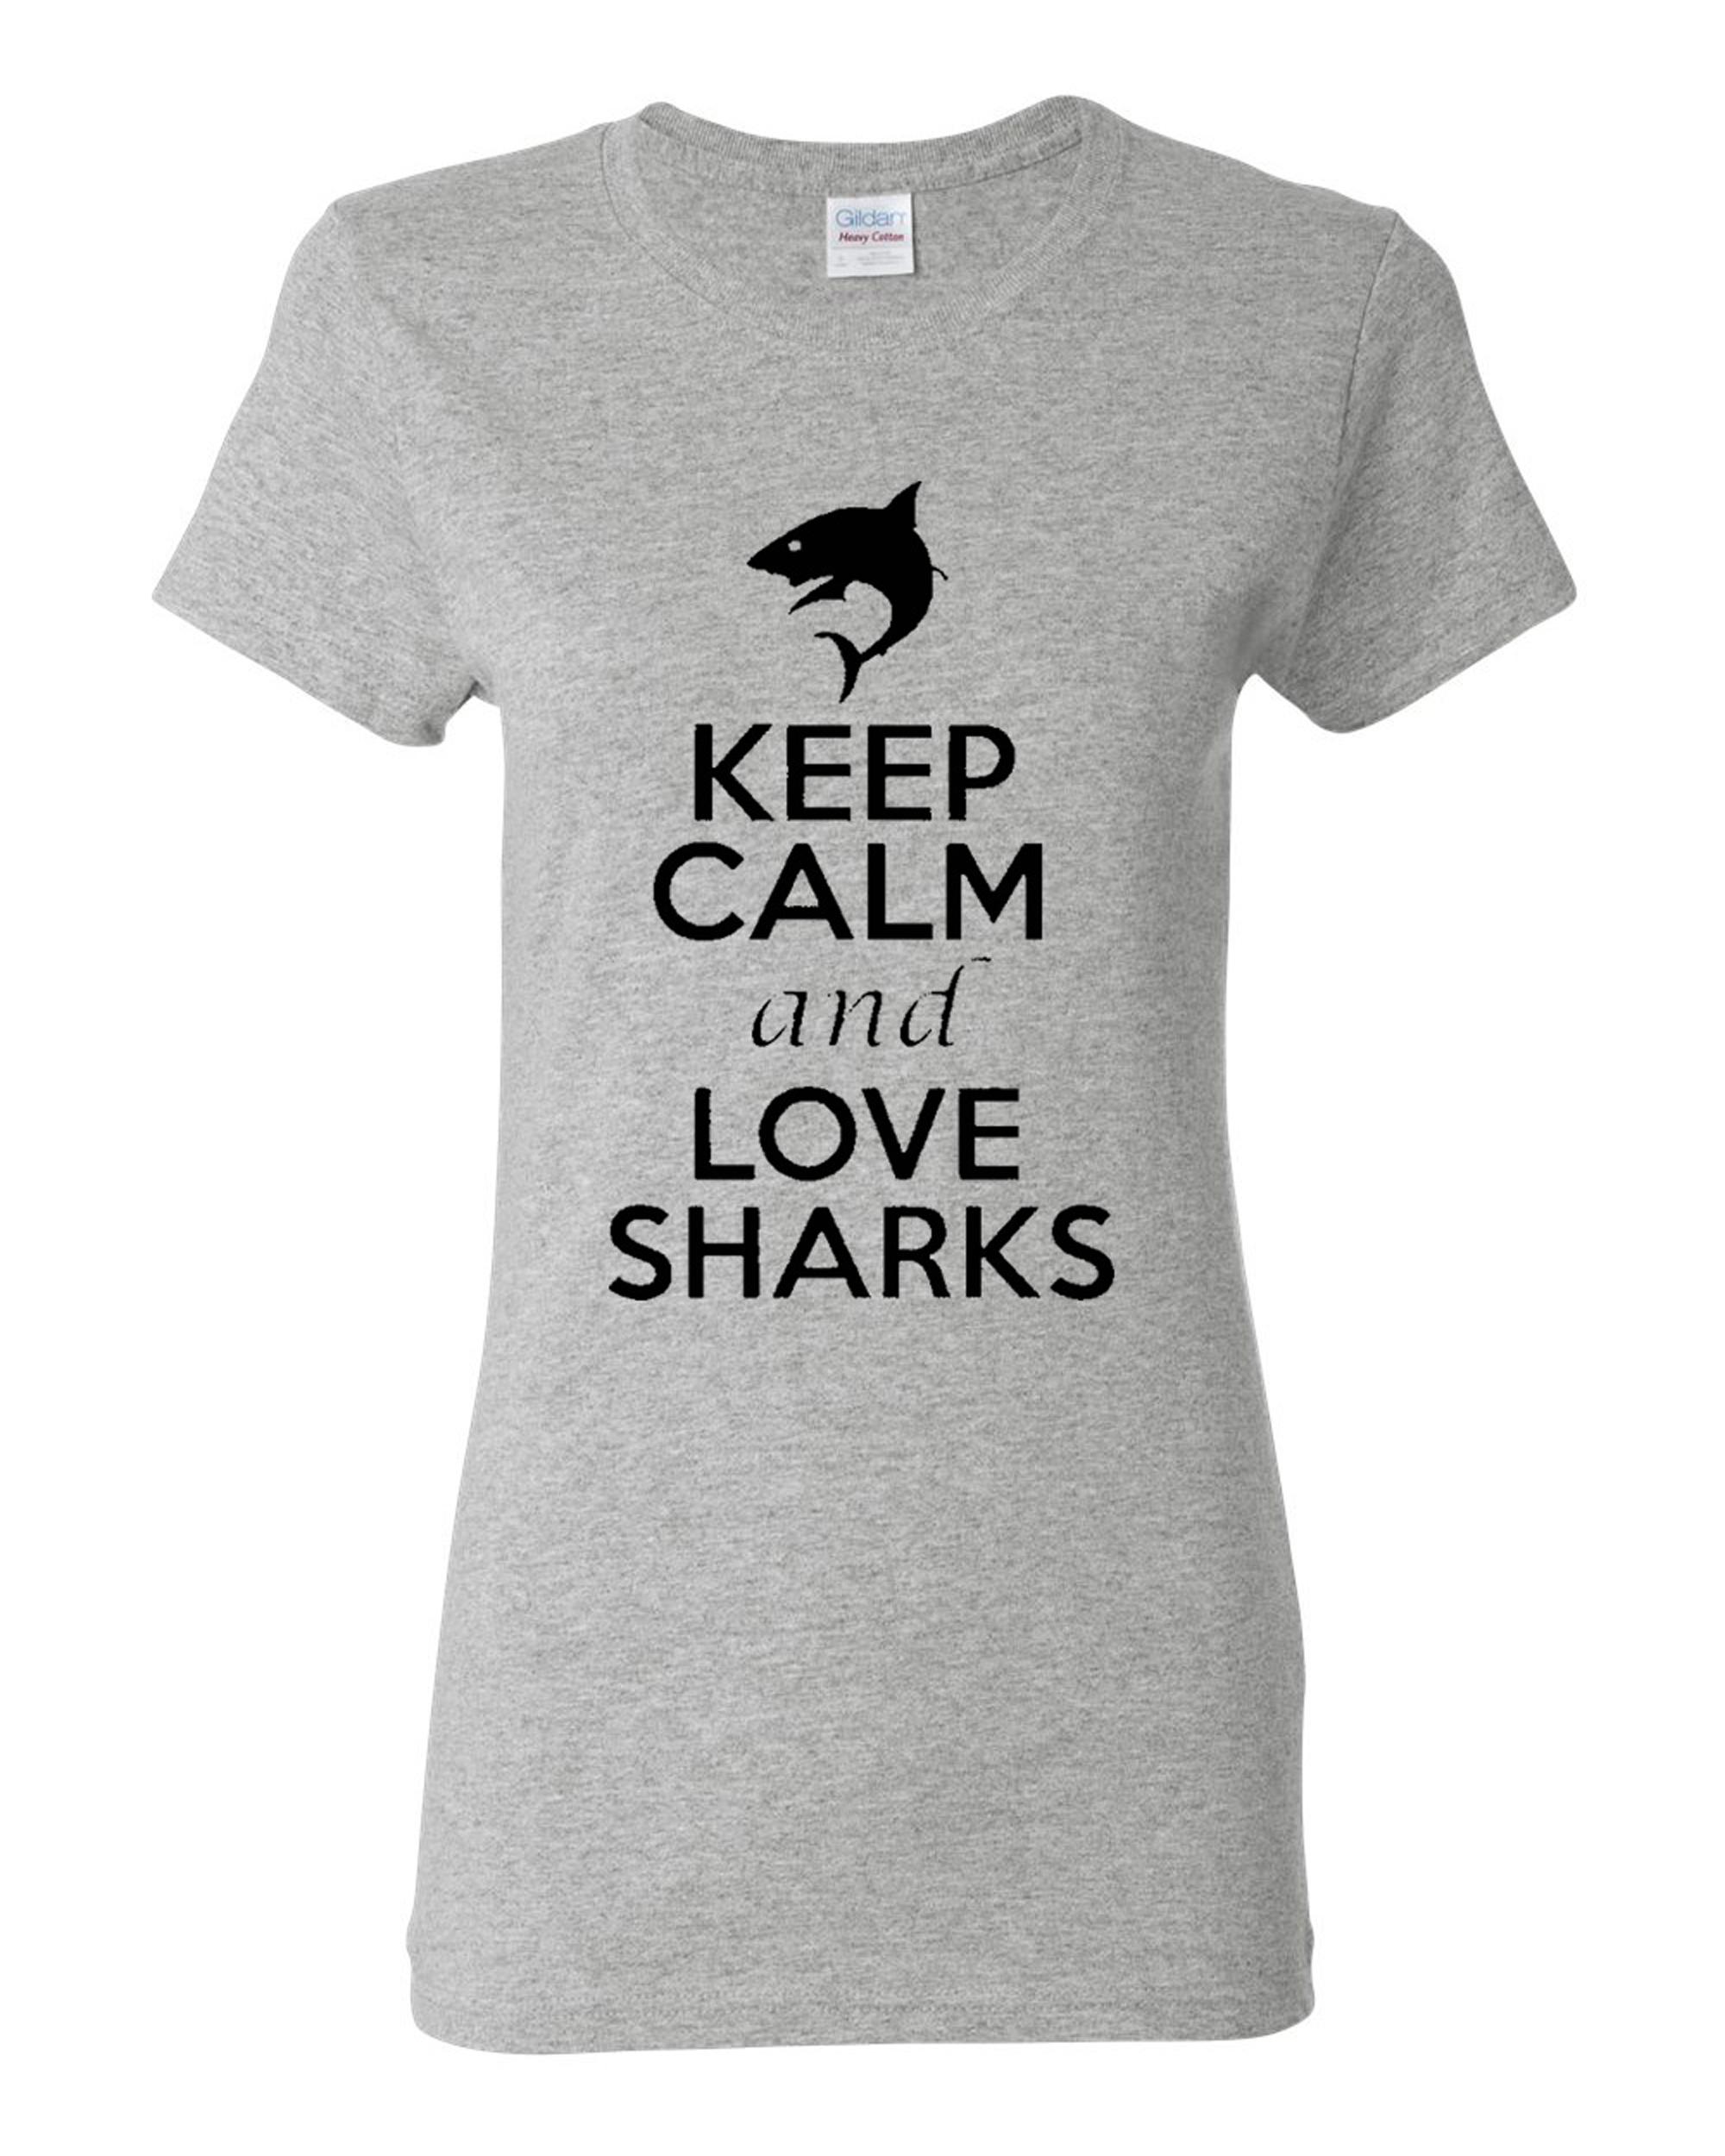 Ladies Keep Calm And Love Sharks T-Shirt Tee